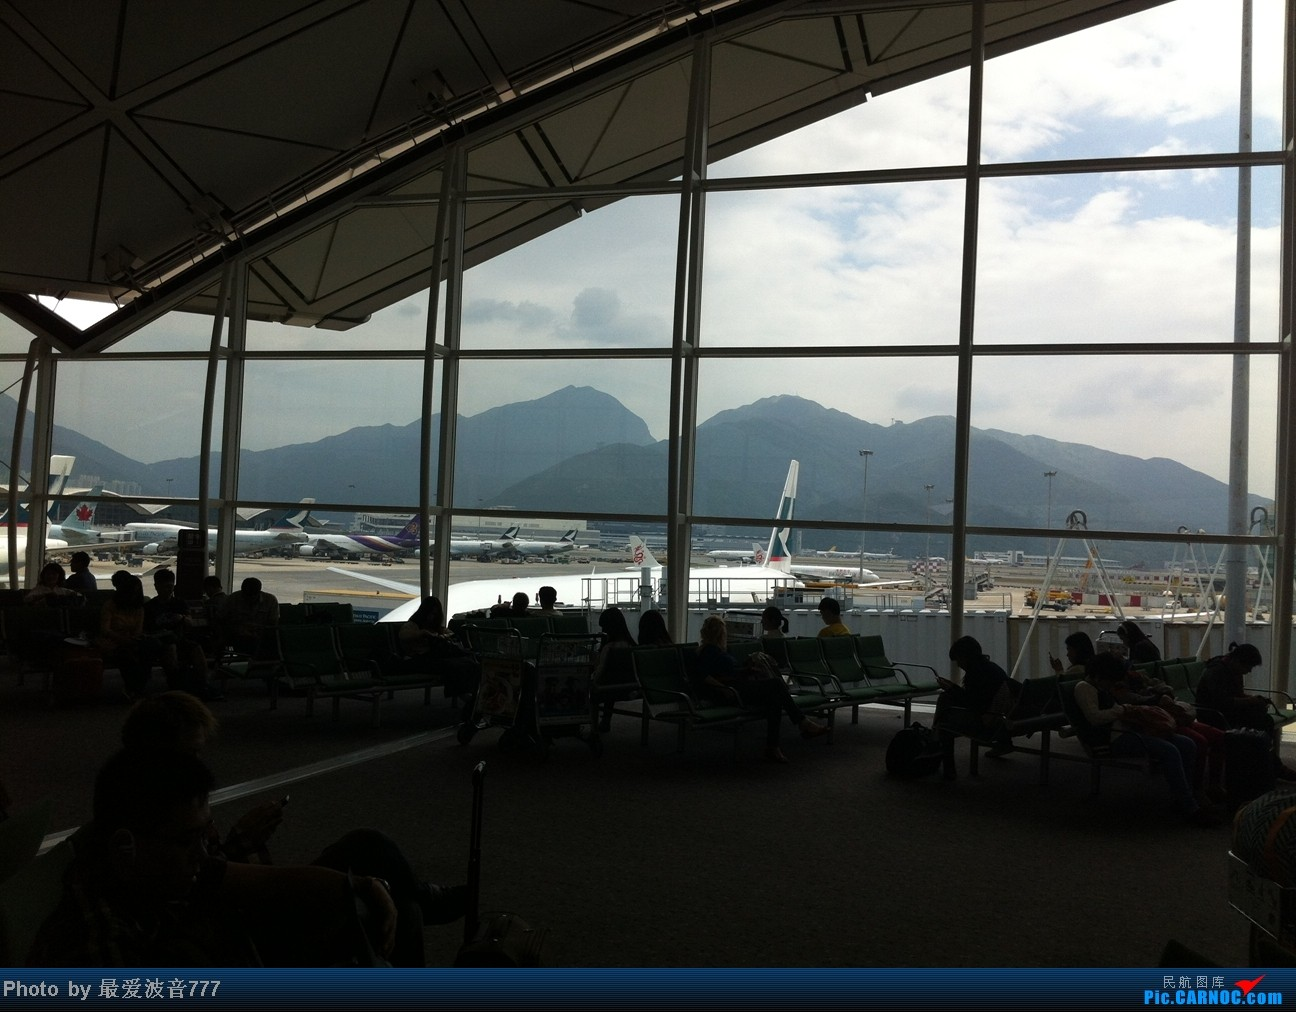 Re:[原创]假期的回国往返之旅 LHR-HKG-CTU-HKG-LHR, CX+CA+KA联合运营    中国香港赤鱲角国际机场